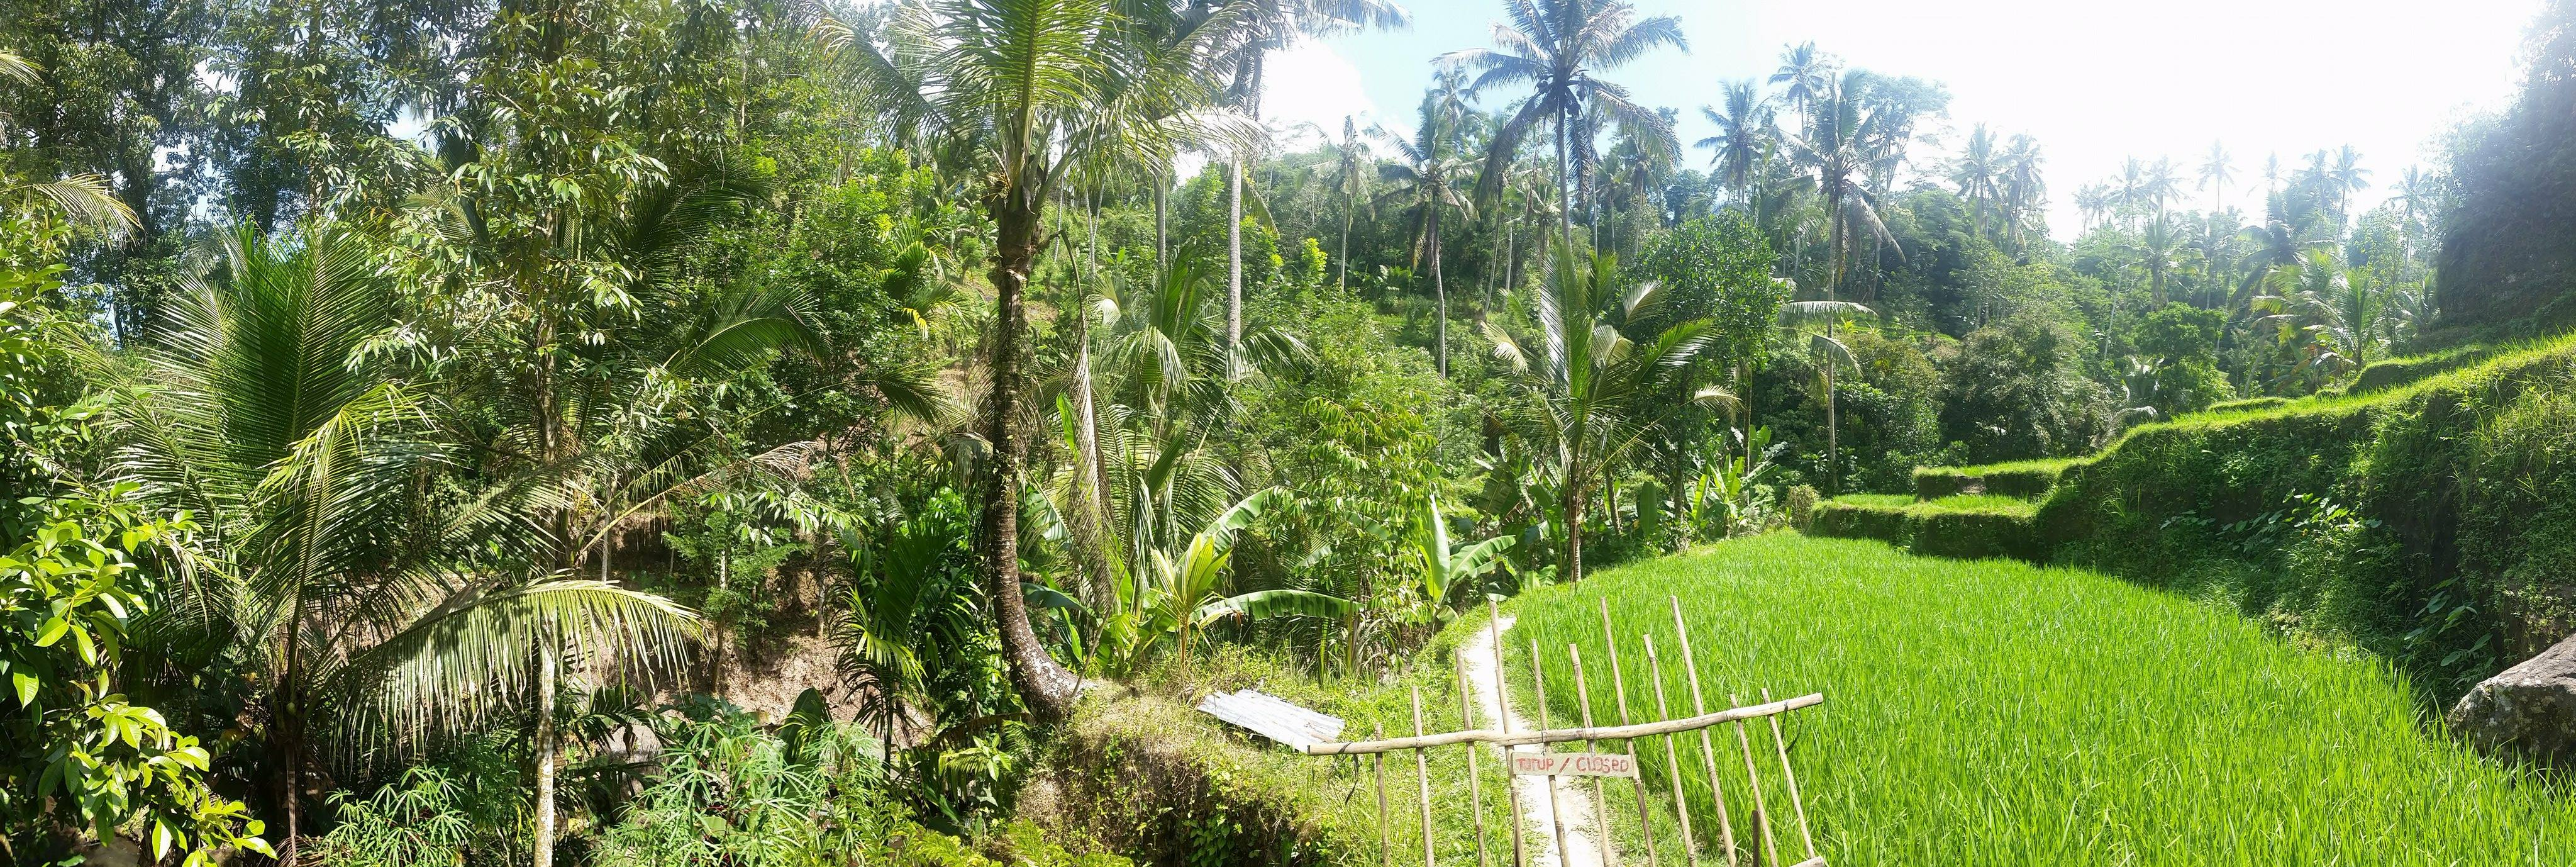 Pura Gunung Kawi Panorama